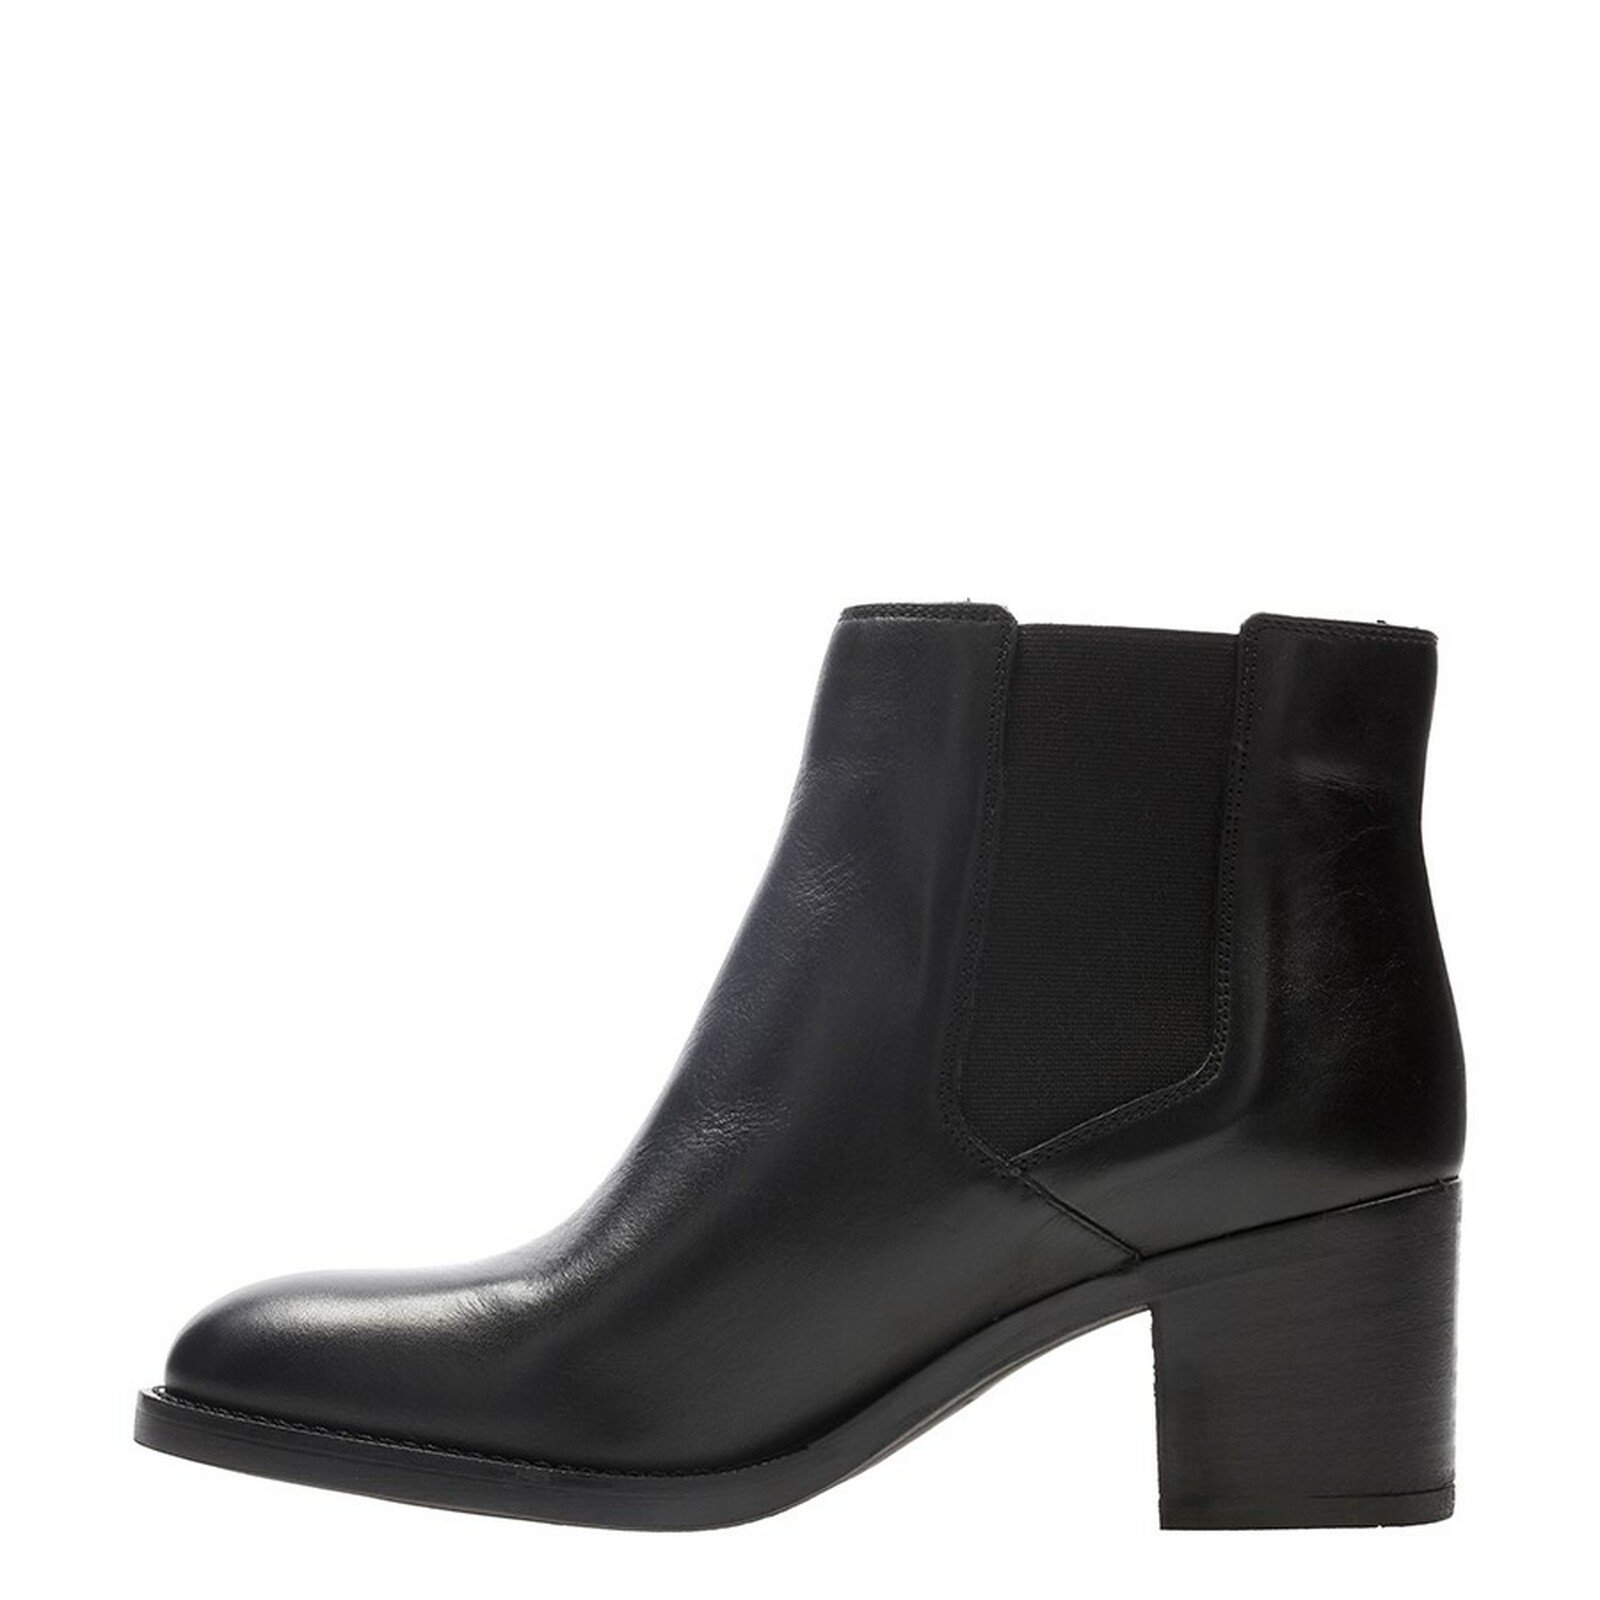 Clarks Womens MASCARPONE BAY Black Leather